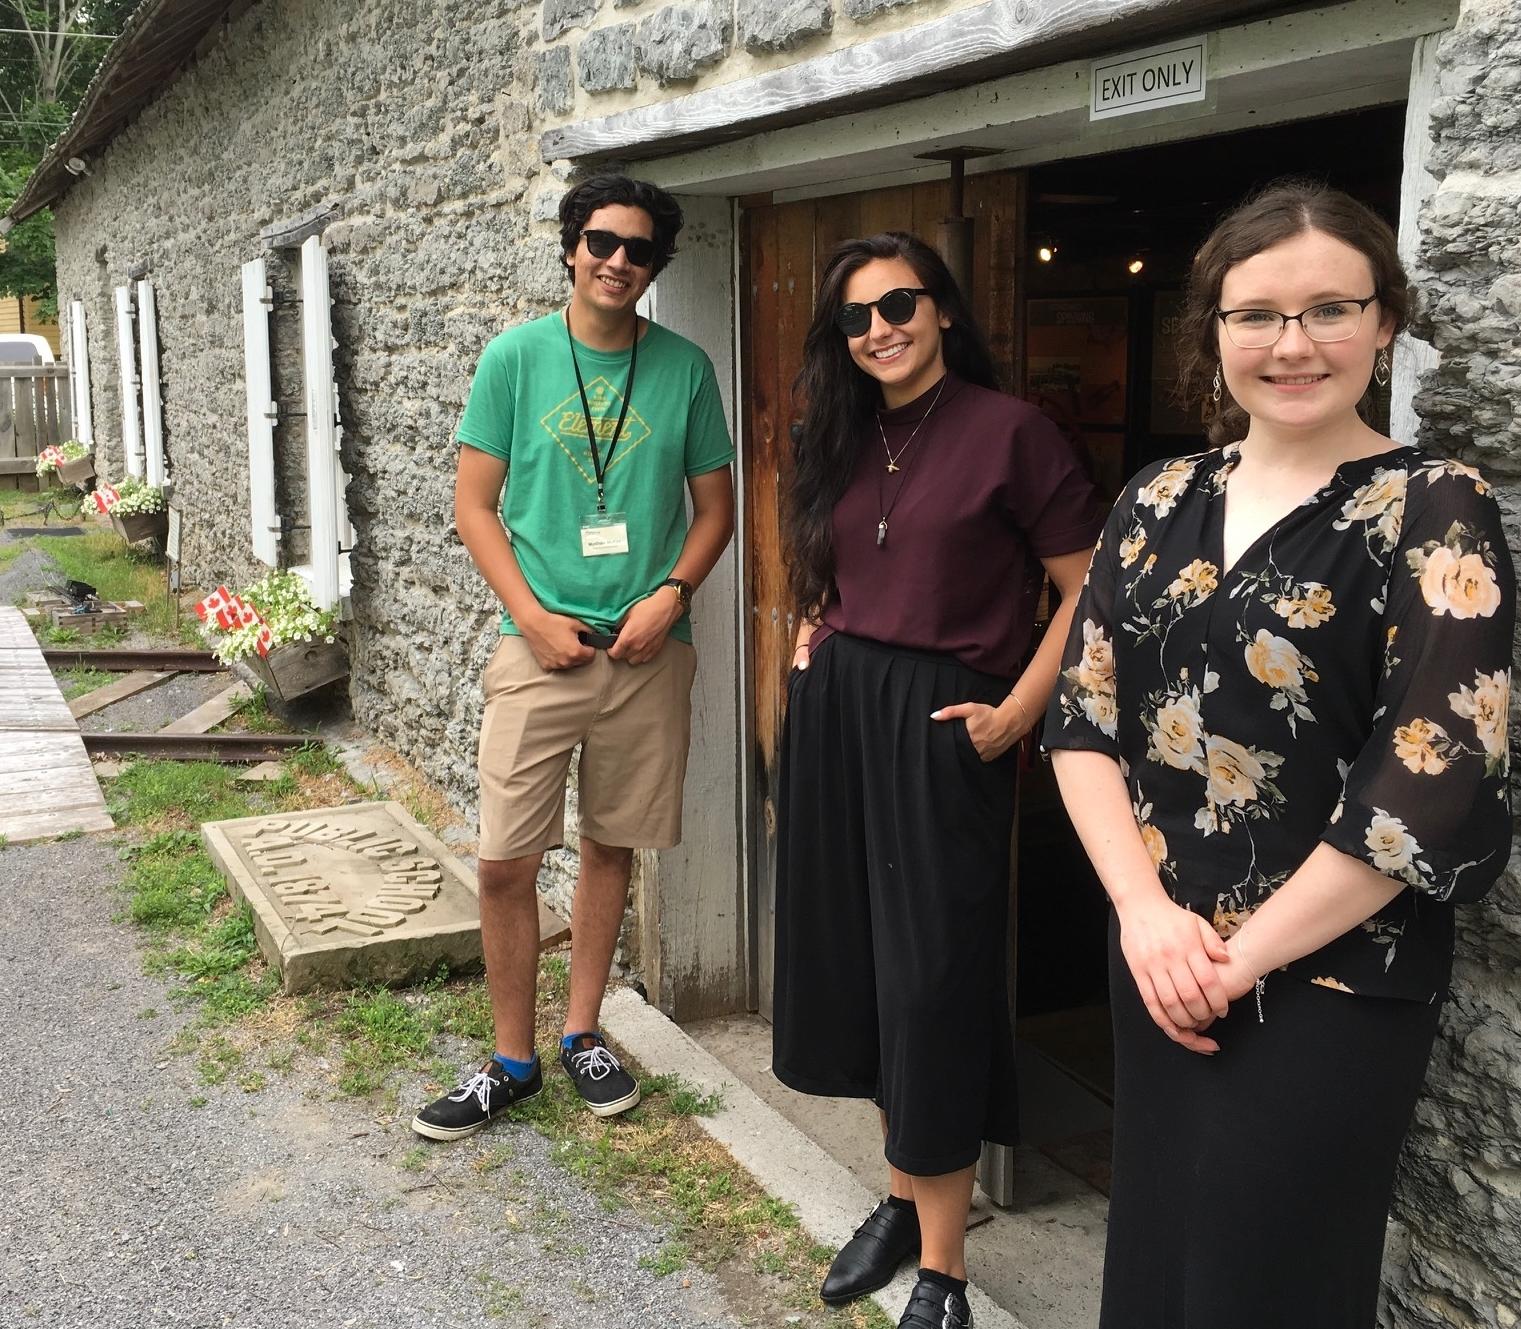 Three young summer staff